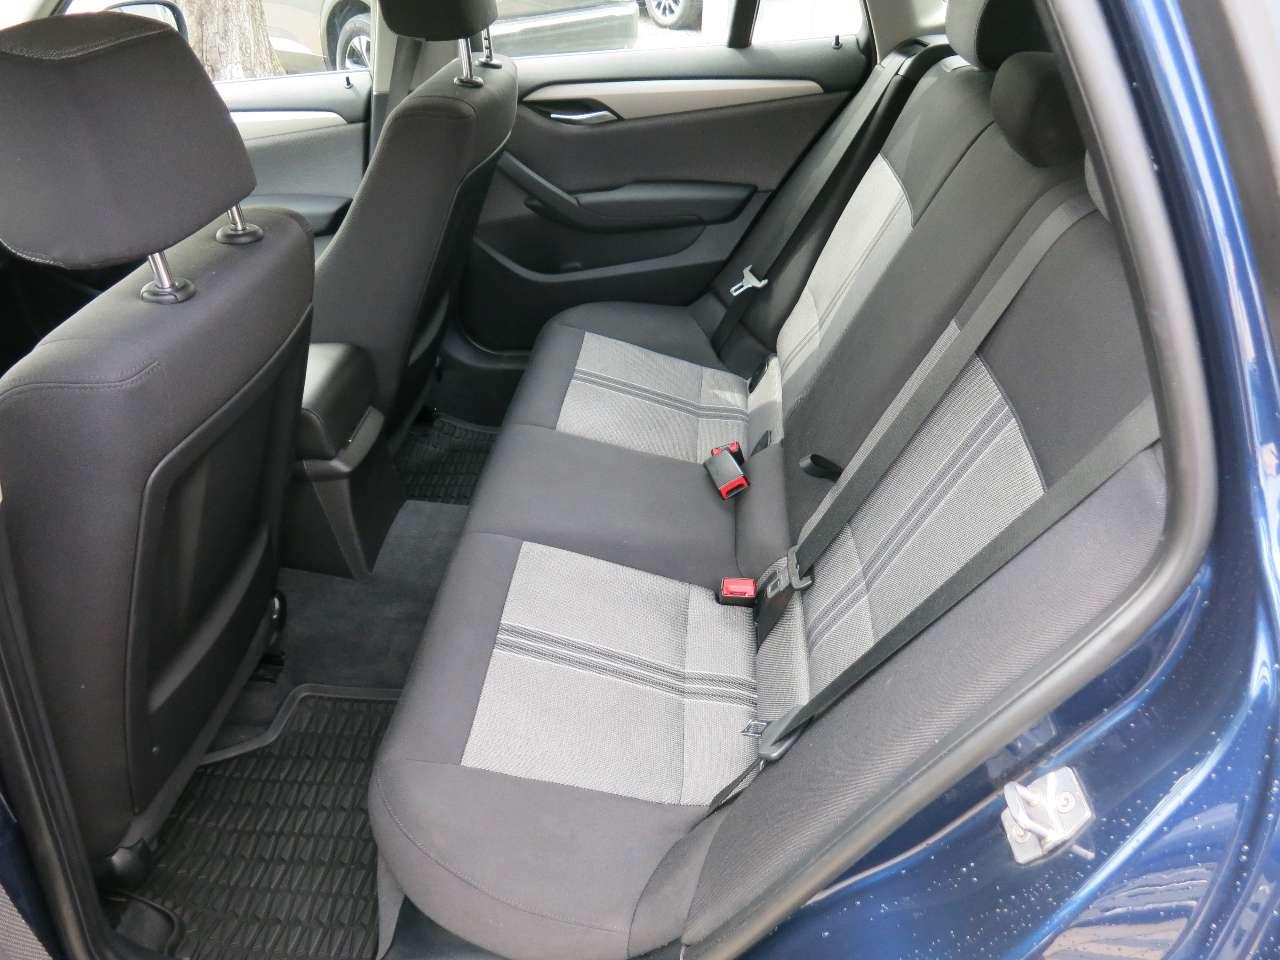 sDrive 18i (E84) XENON NAVI PDC TÜV+AU 03/2023